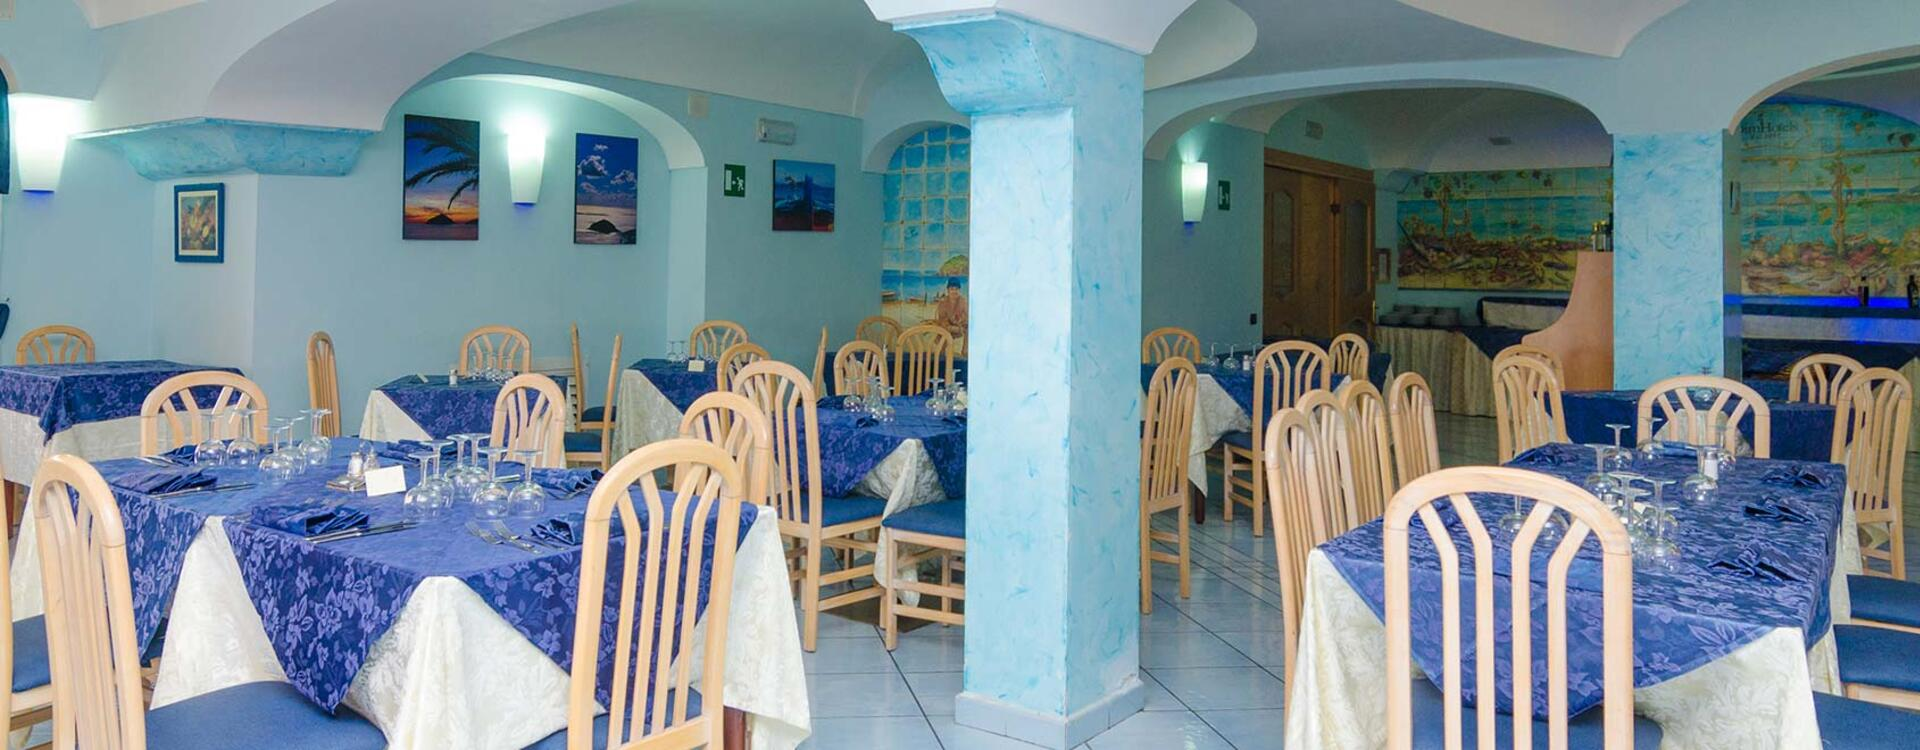 hotelsaintraphaelischia it hotel-con-ristorante-ischia 009